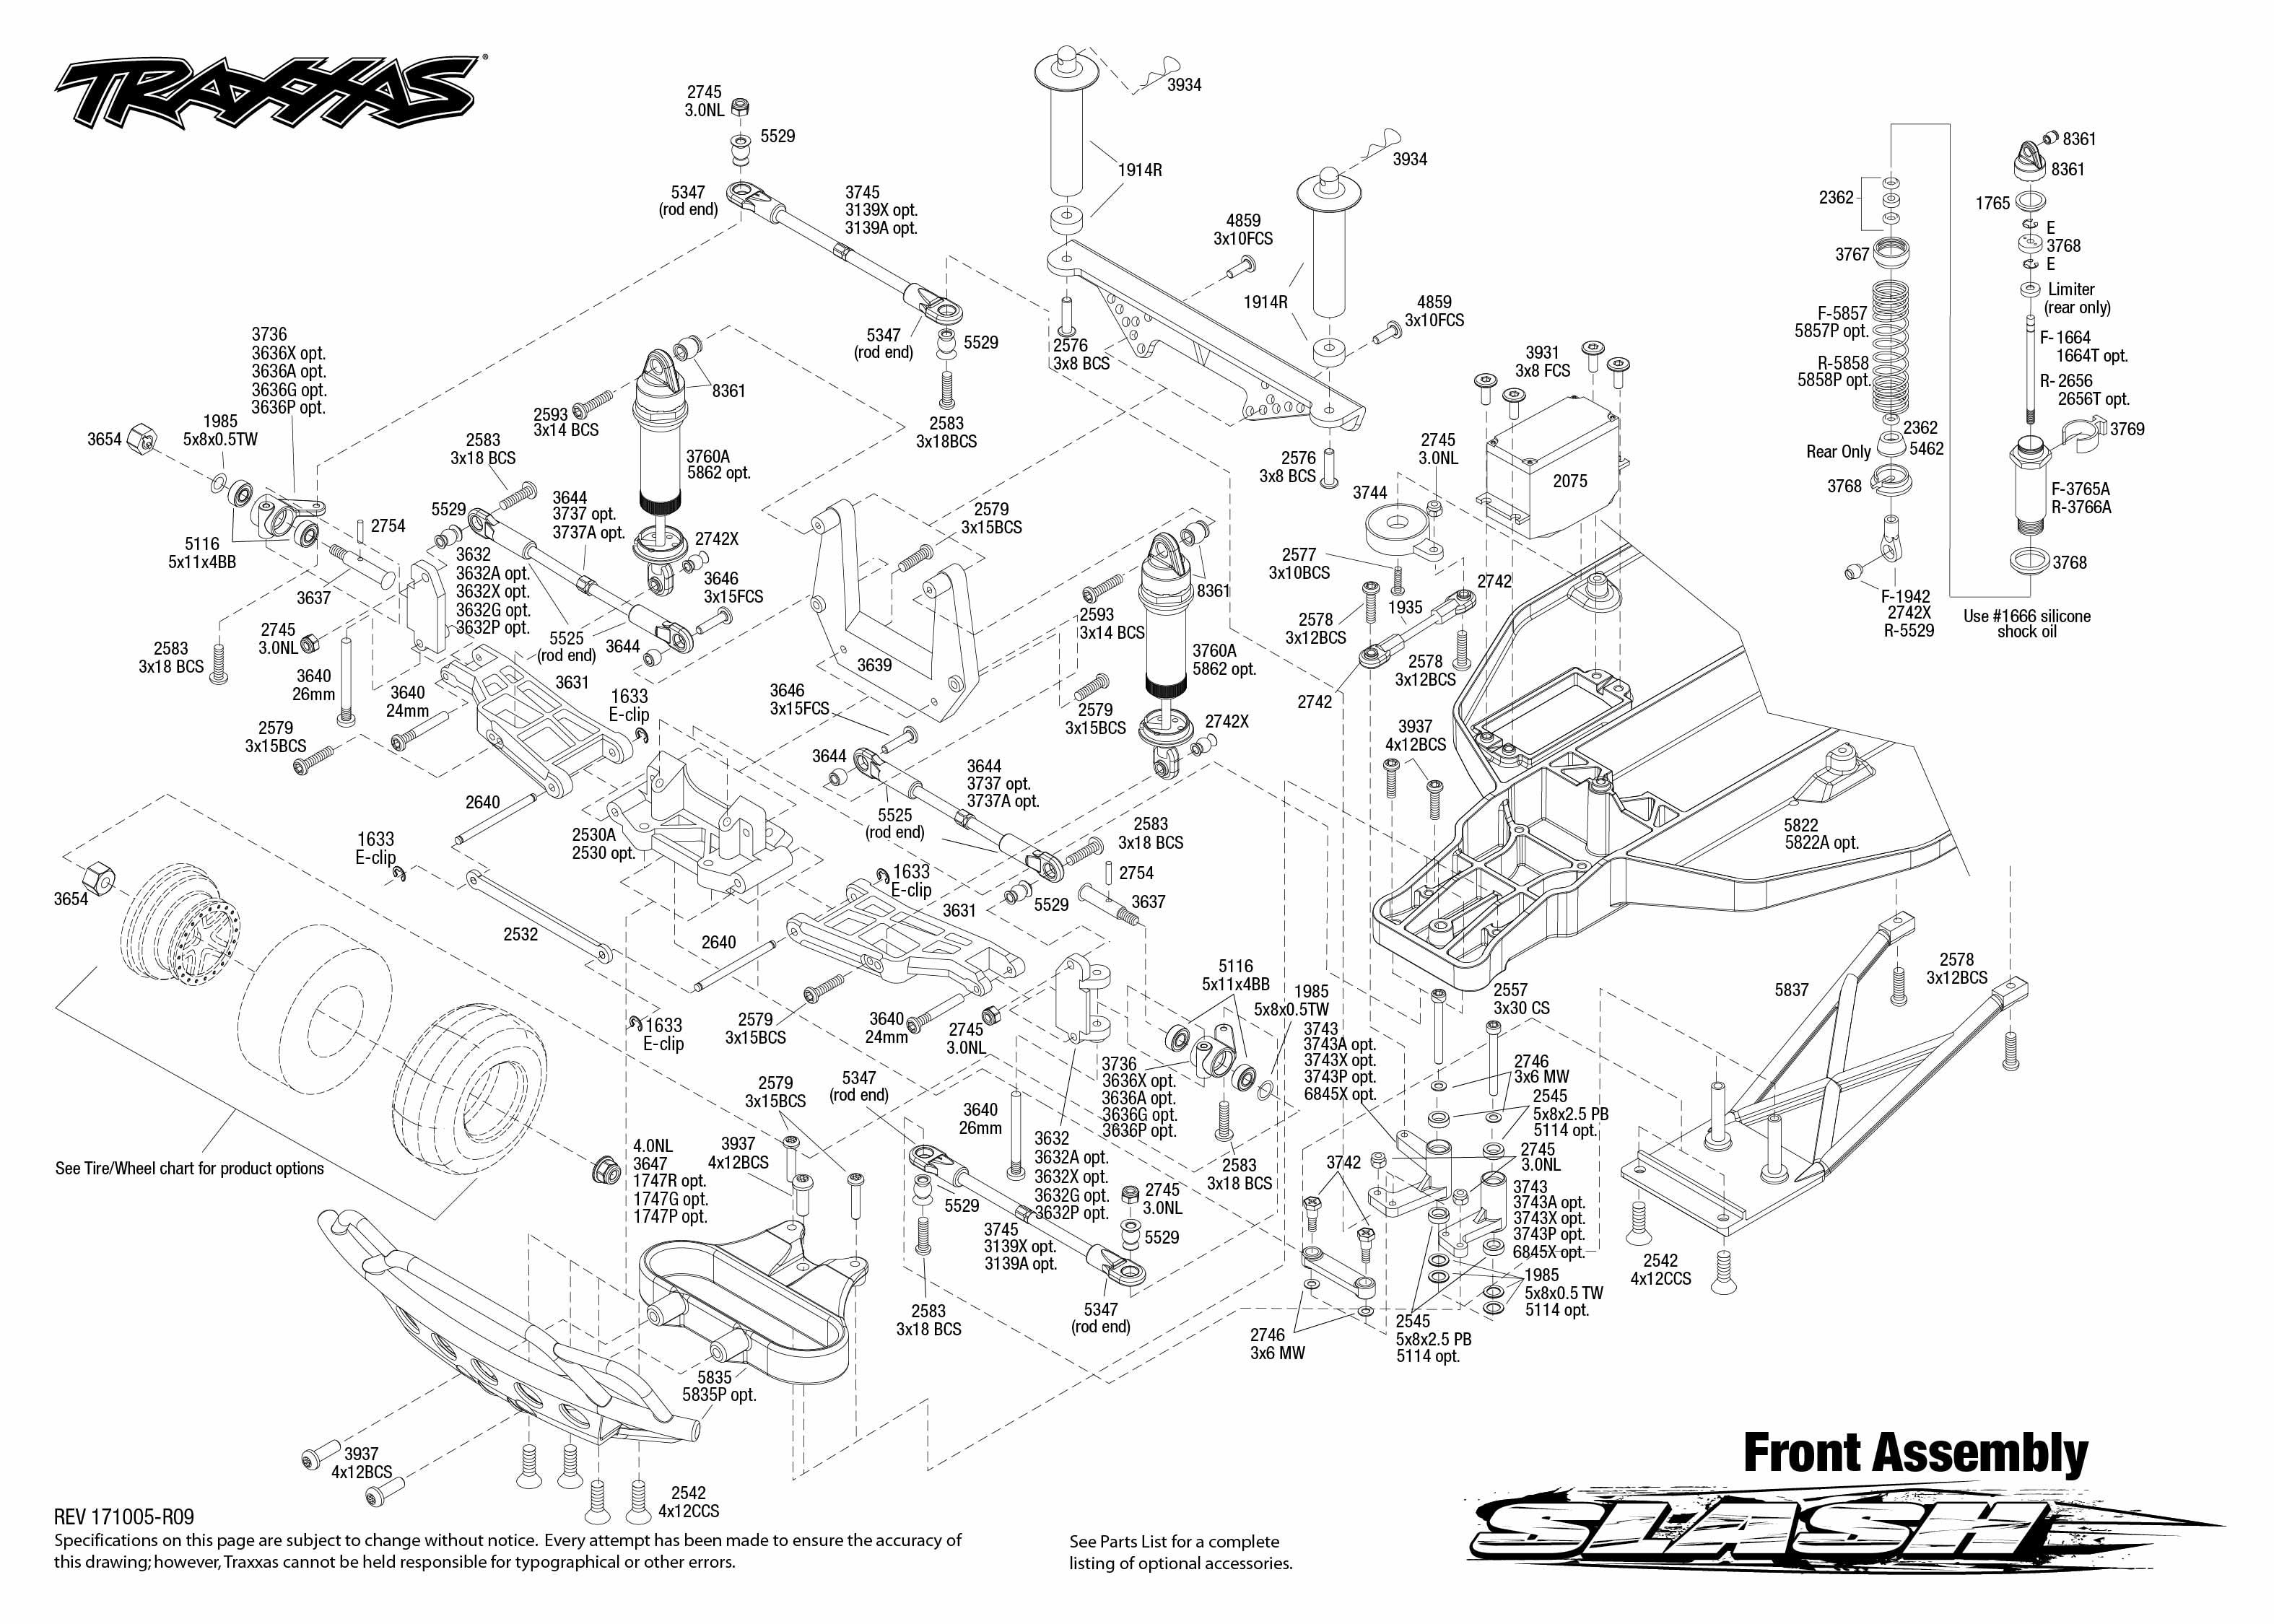 Traxxas Slash 1/10-Scale 2WD SCT w/ TQ 2.4GHz radio system